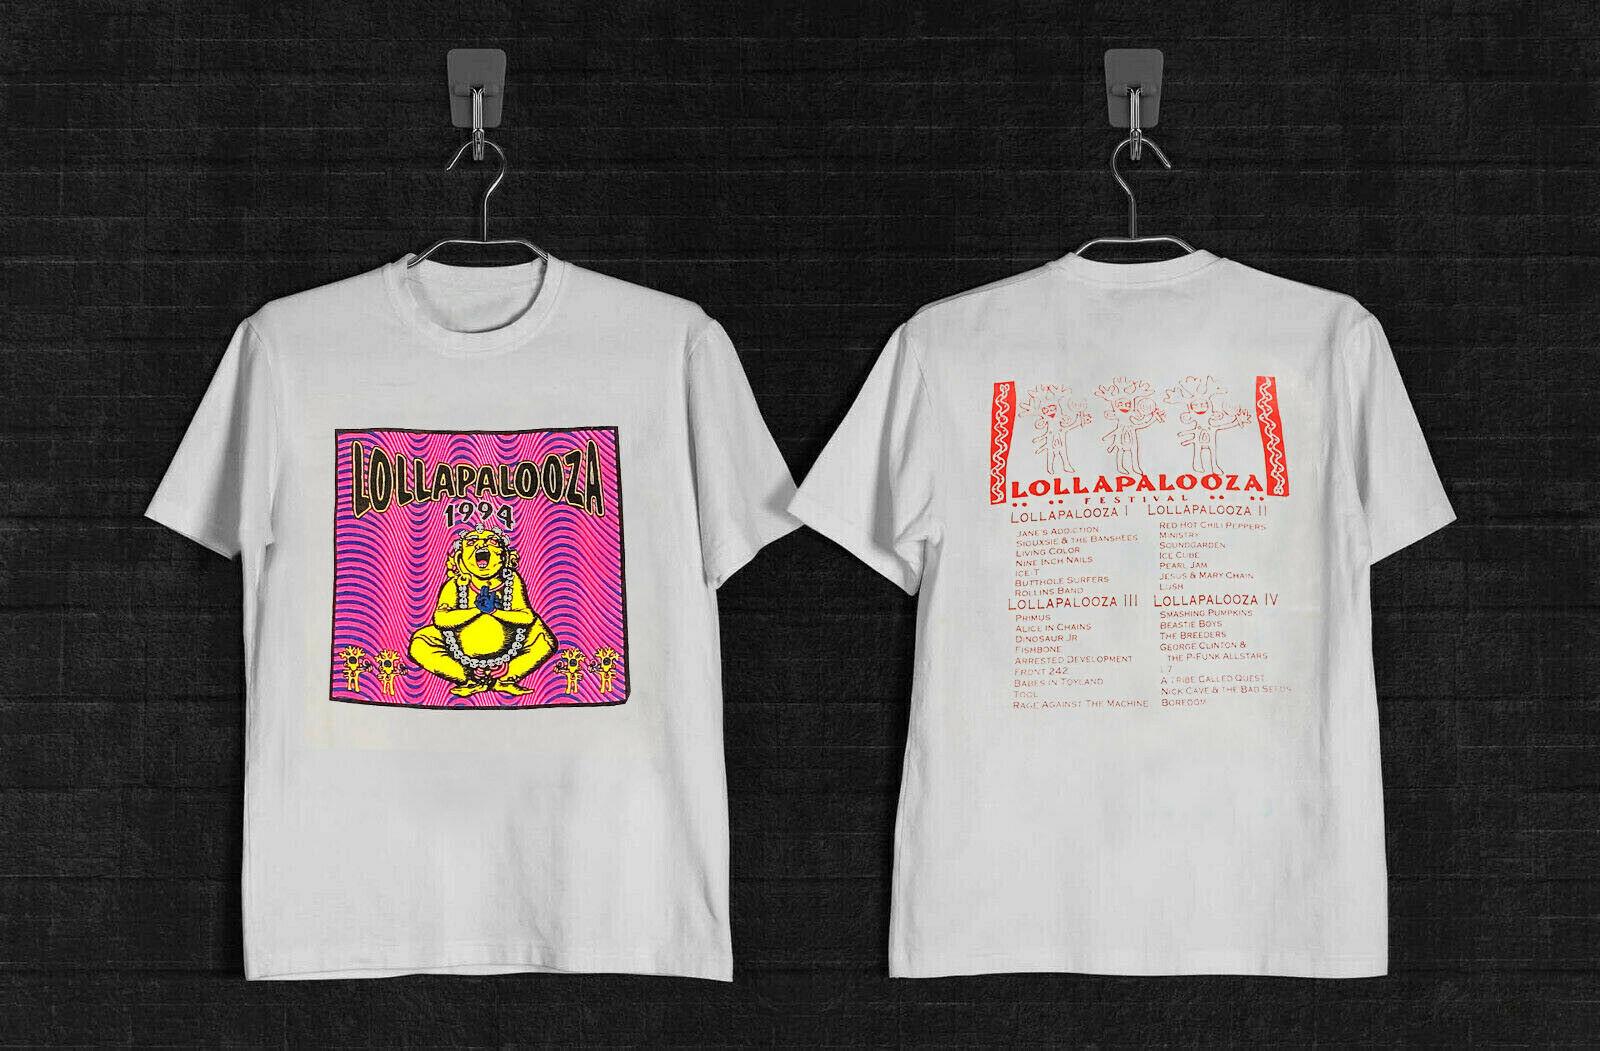 1994 lollapalooza 4 year line tour tshirt branco impressão superior